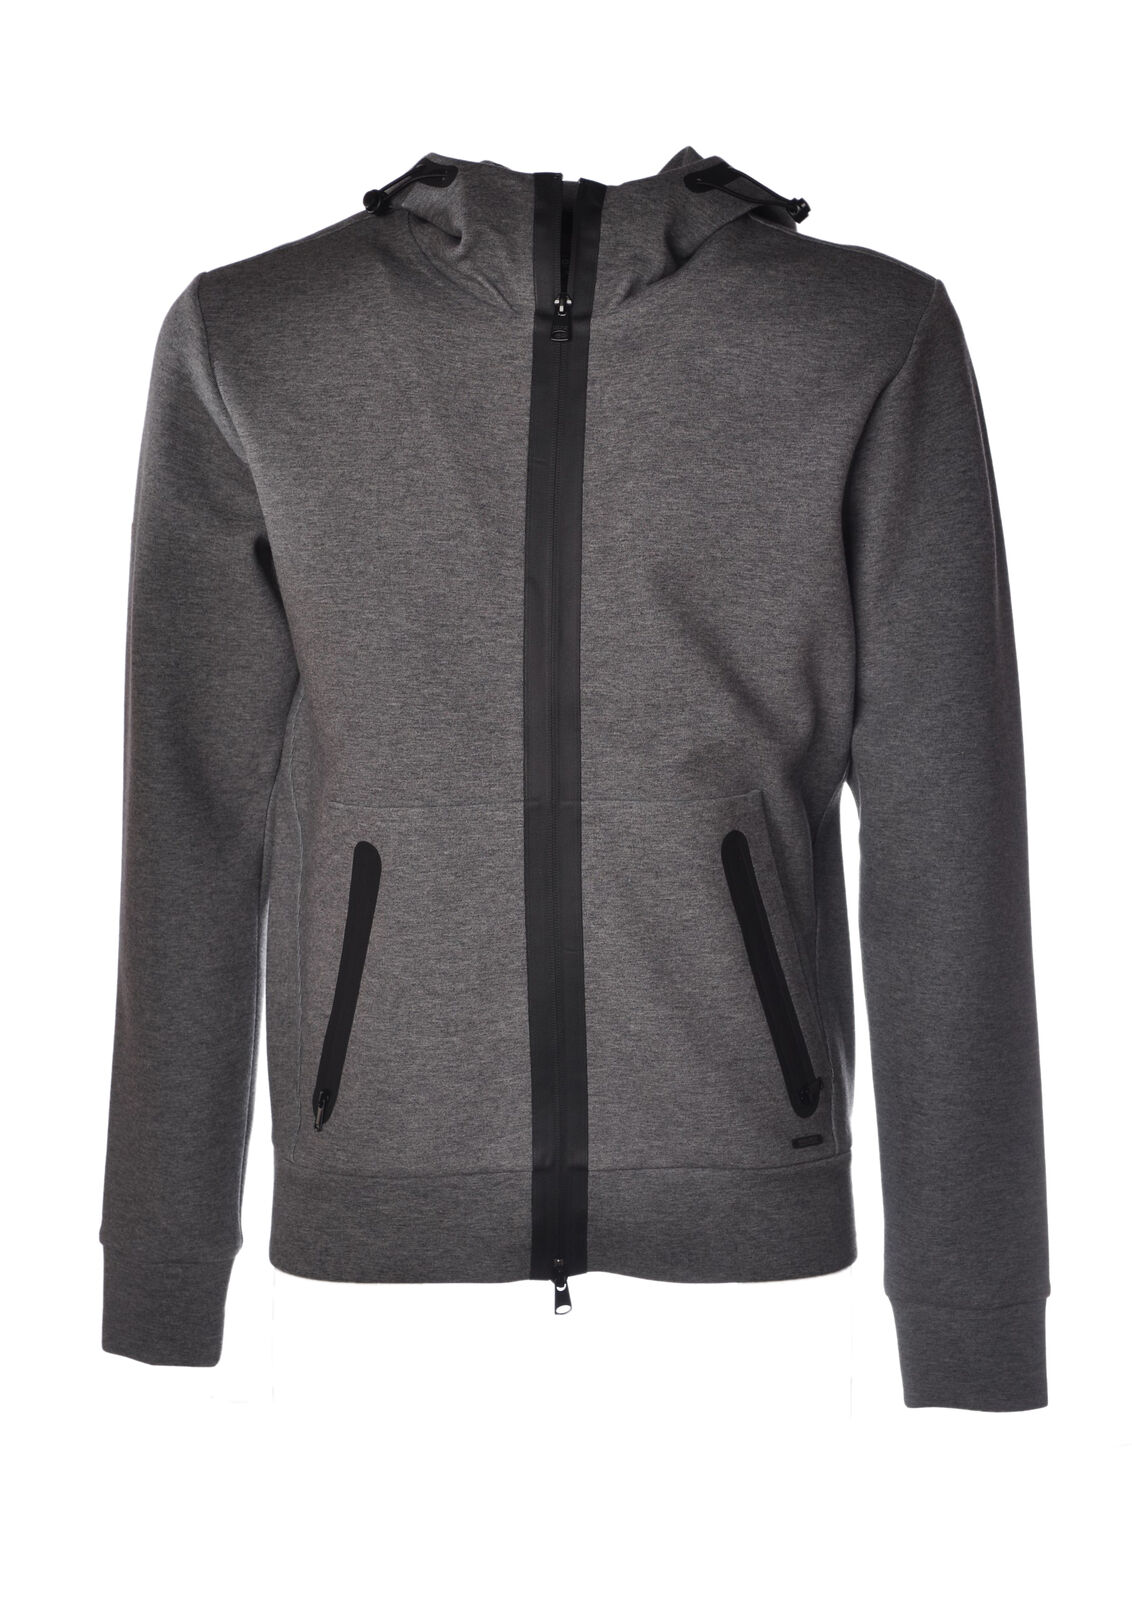 Woolrich - Topwear-schweißhemds - Man - grau - 5004716D183749